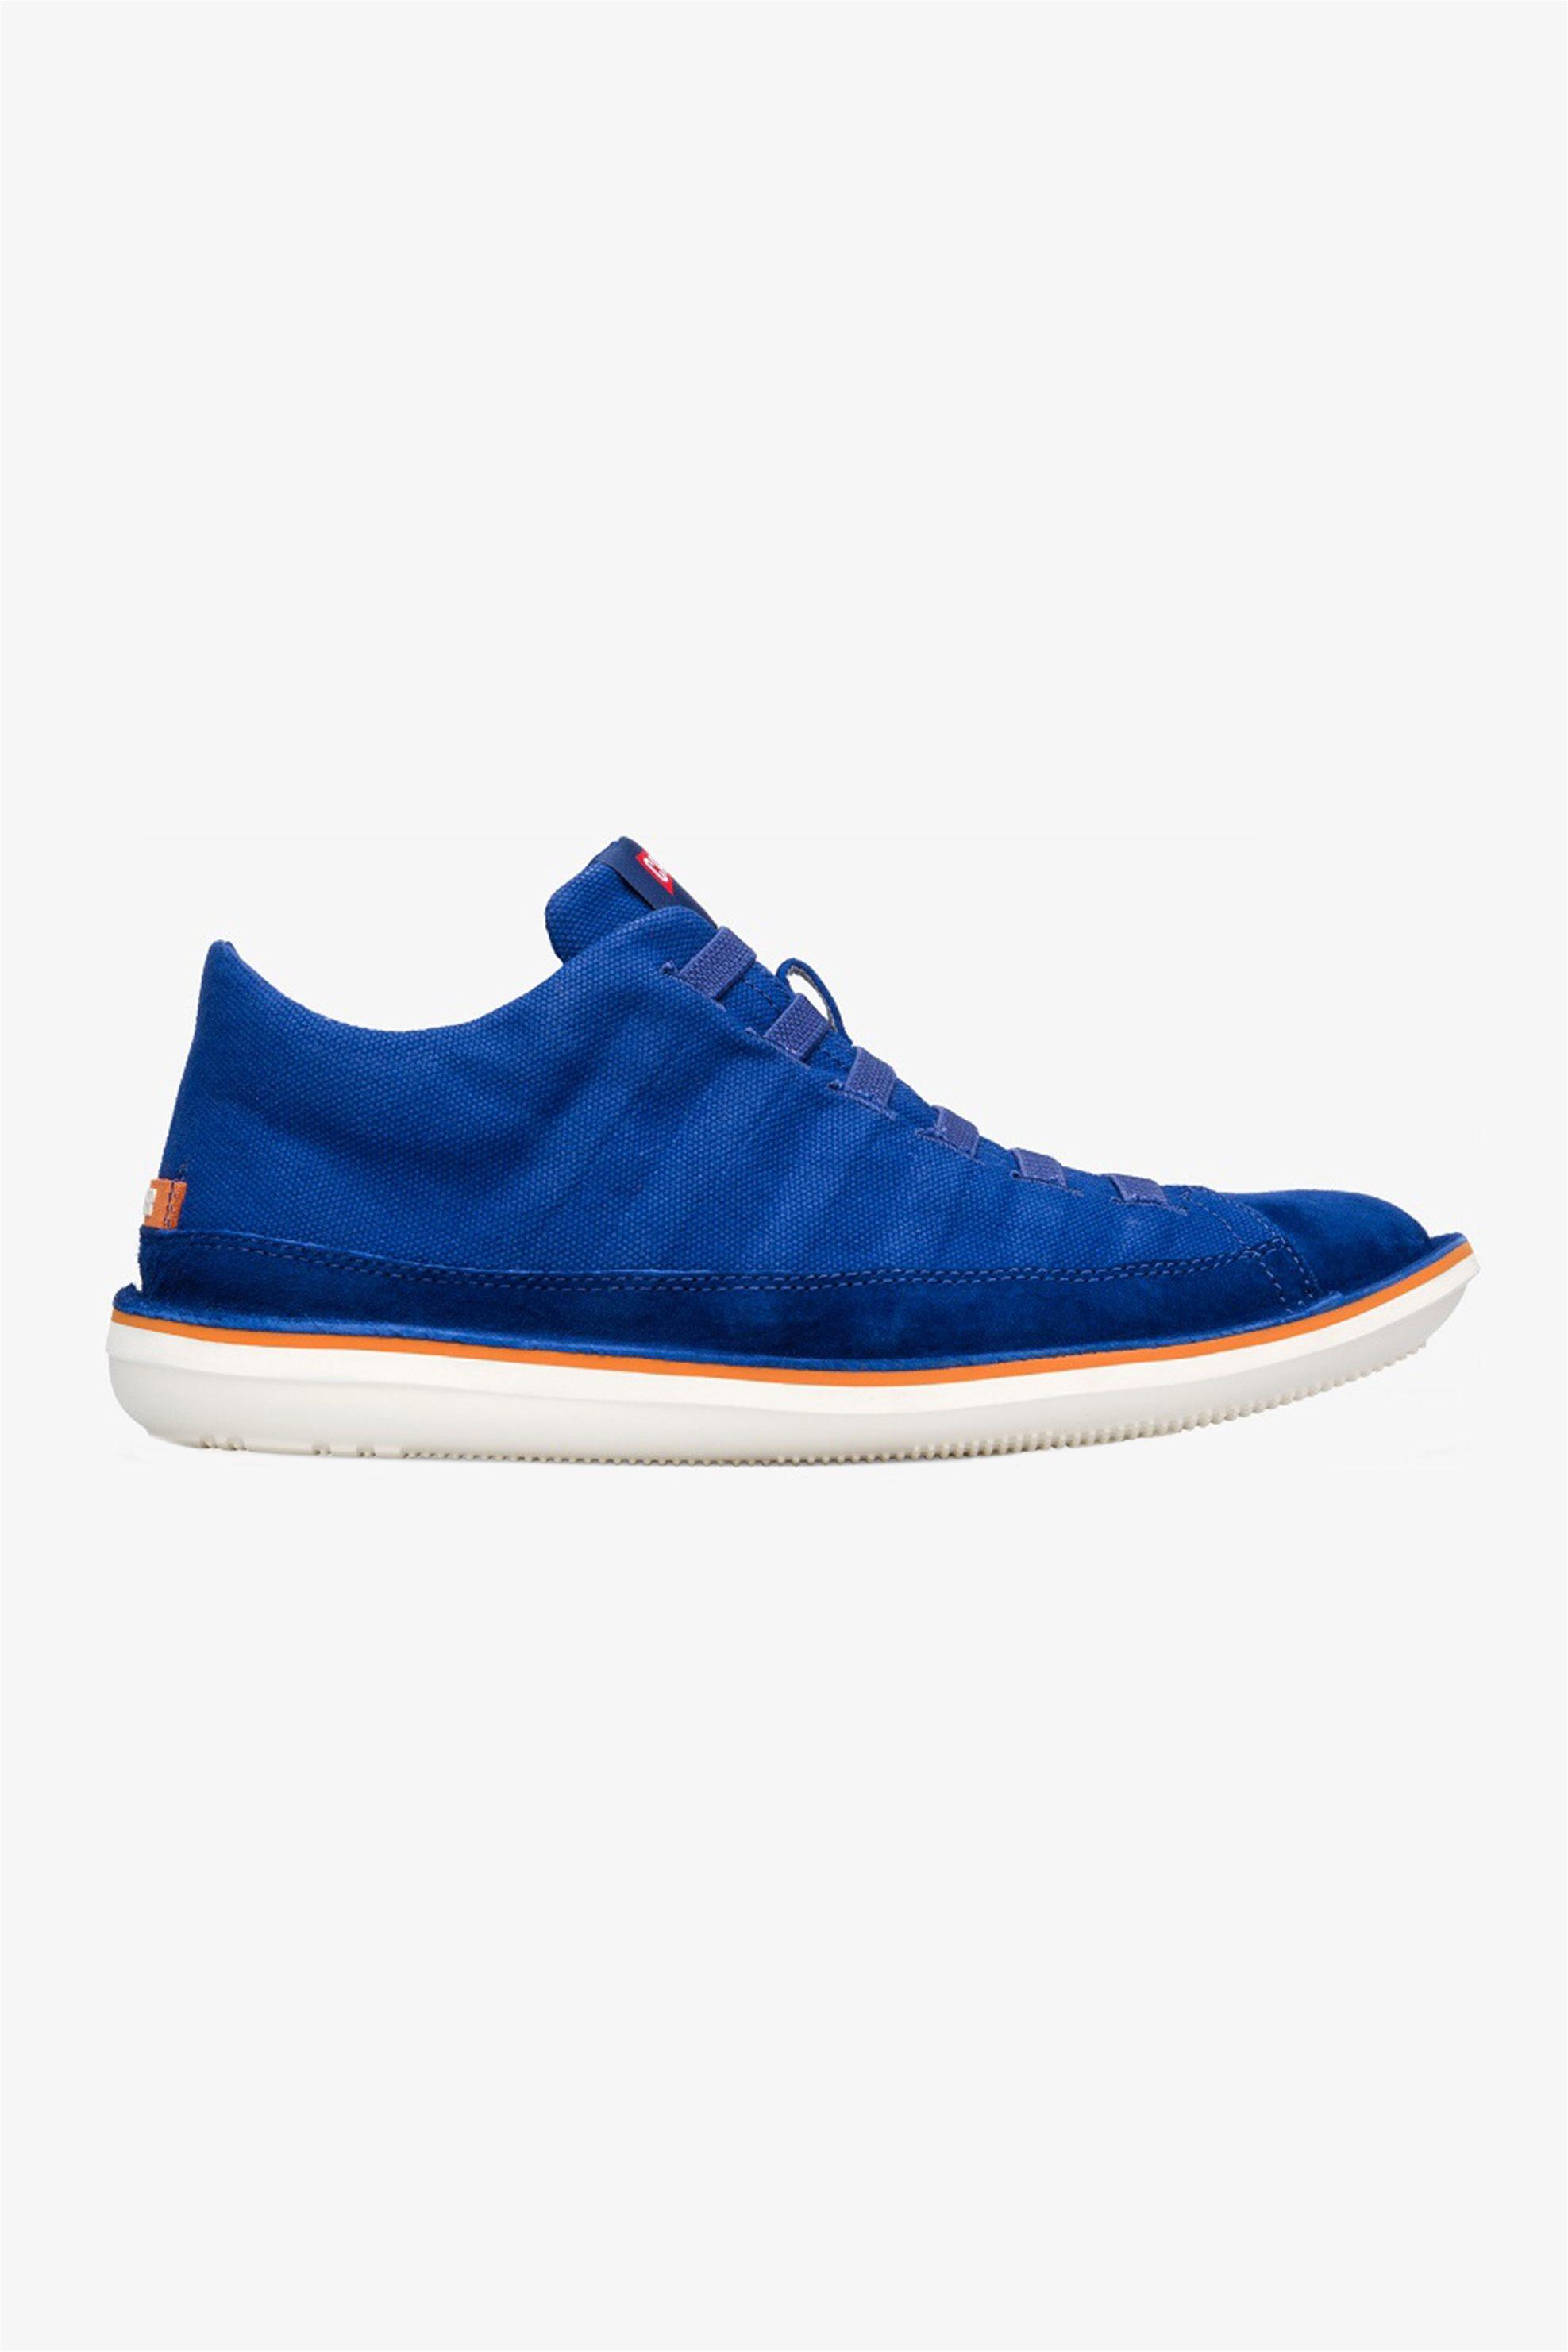 "Camper ανδρικά suede sneakers με ελαστικά κορδόνια και ανάγλυφο σχέδιο ""Beetle"" – 36791-055 – Μπλε Ηλεκτρίκ"